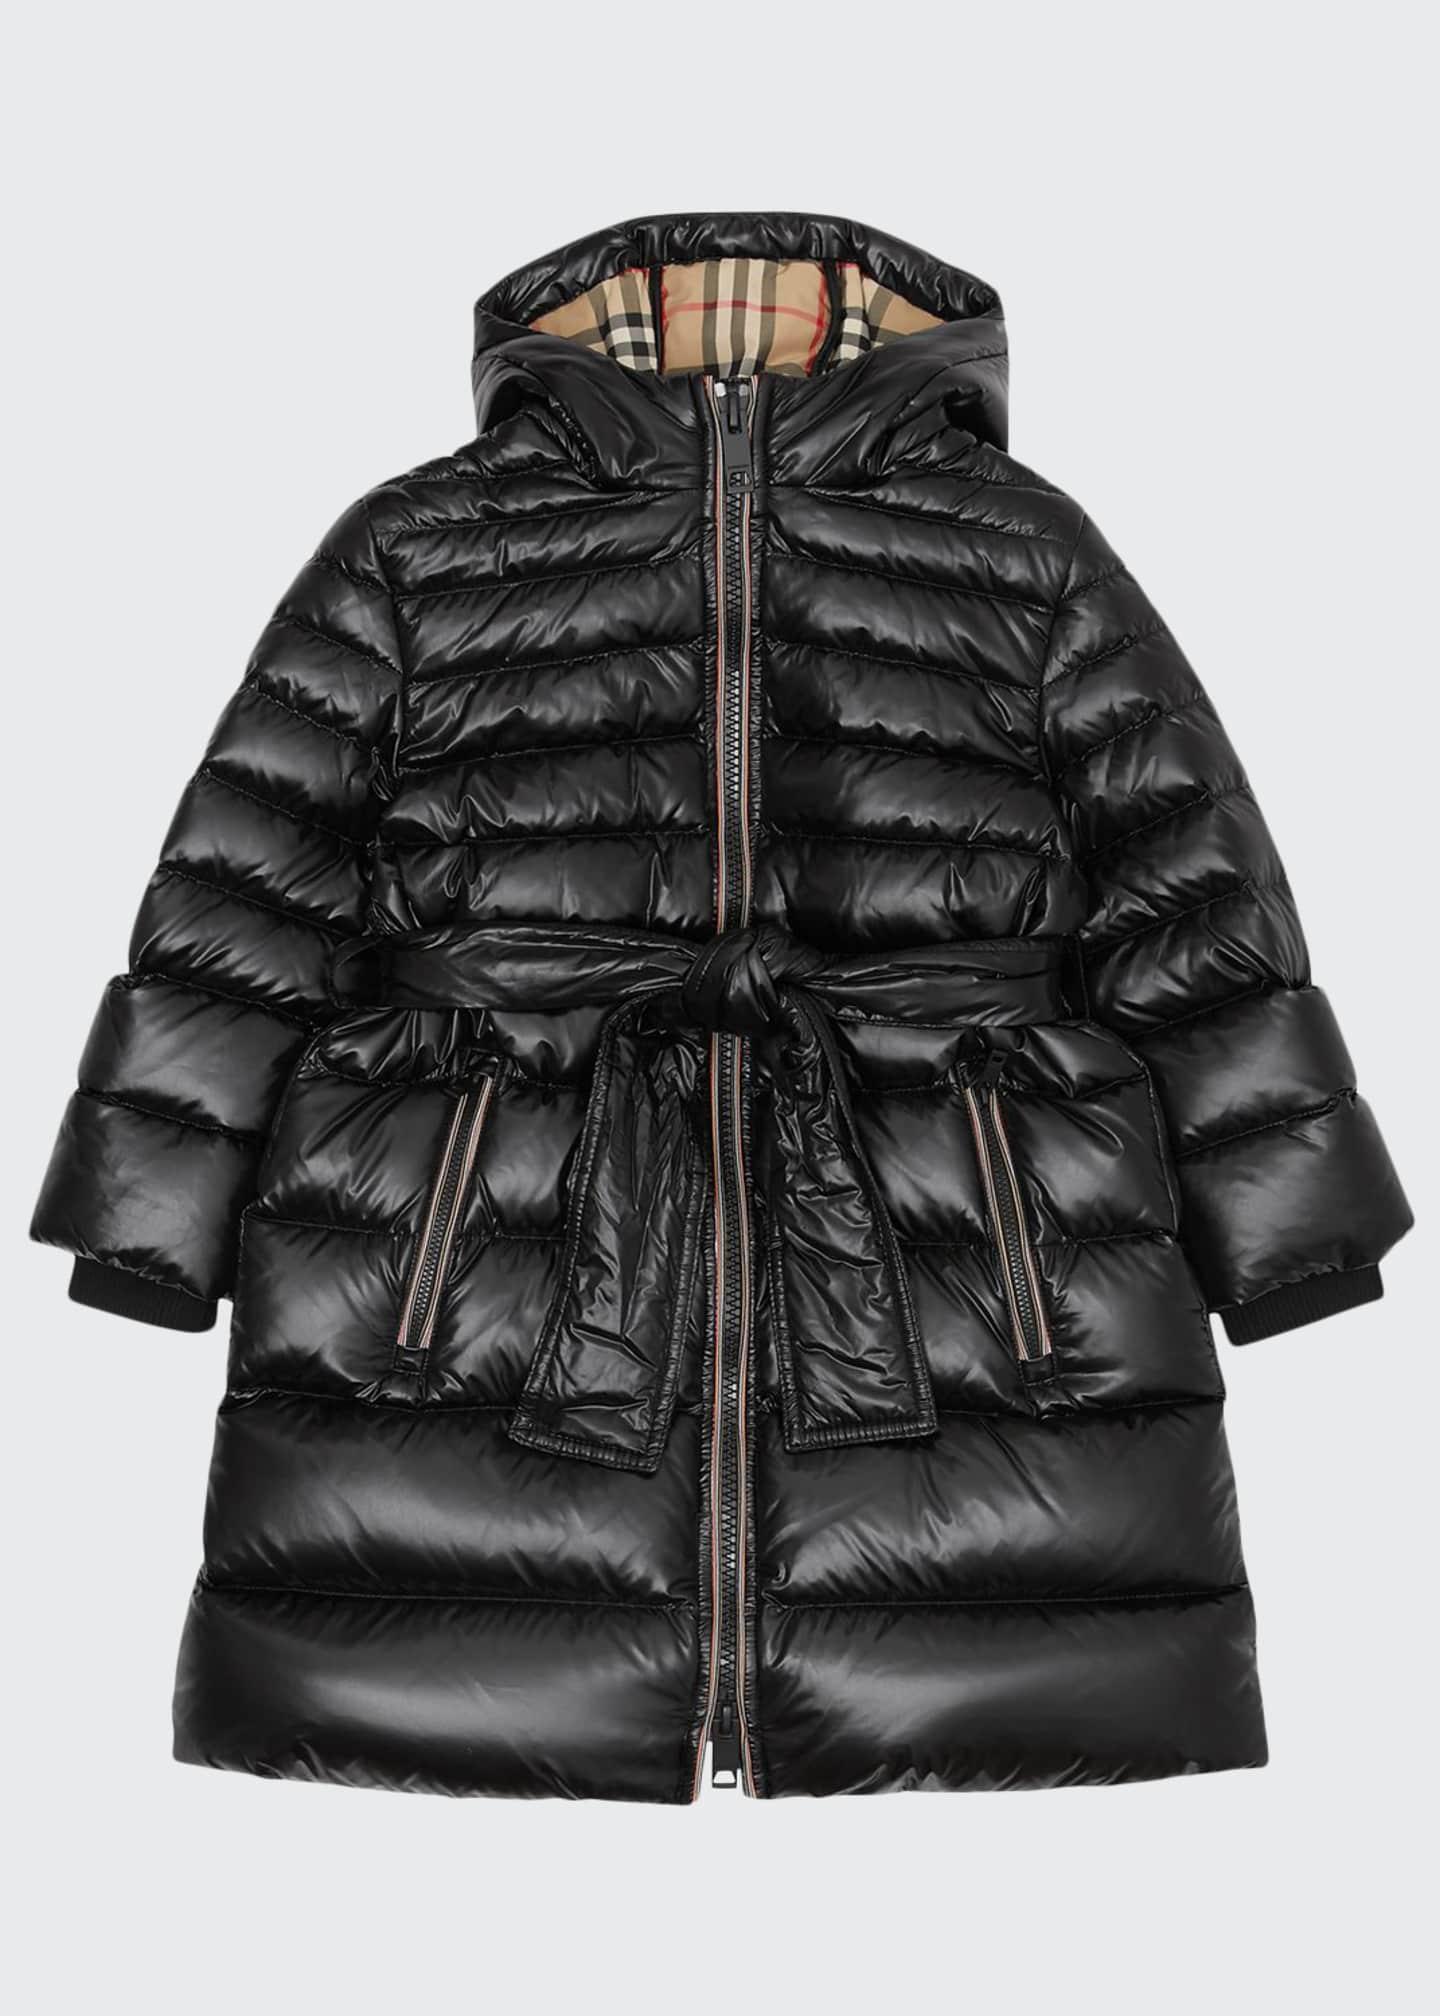 Burberry Girl's Sharona Long Puffer Coat, Size 3-14